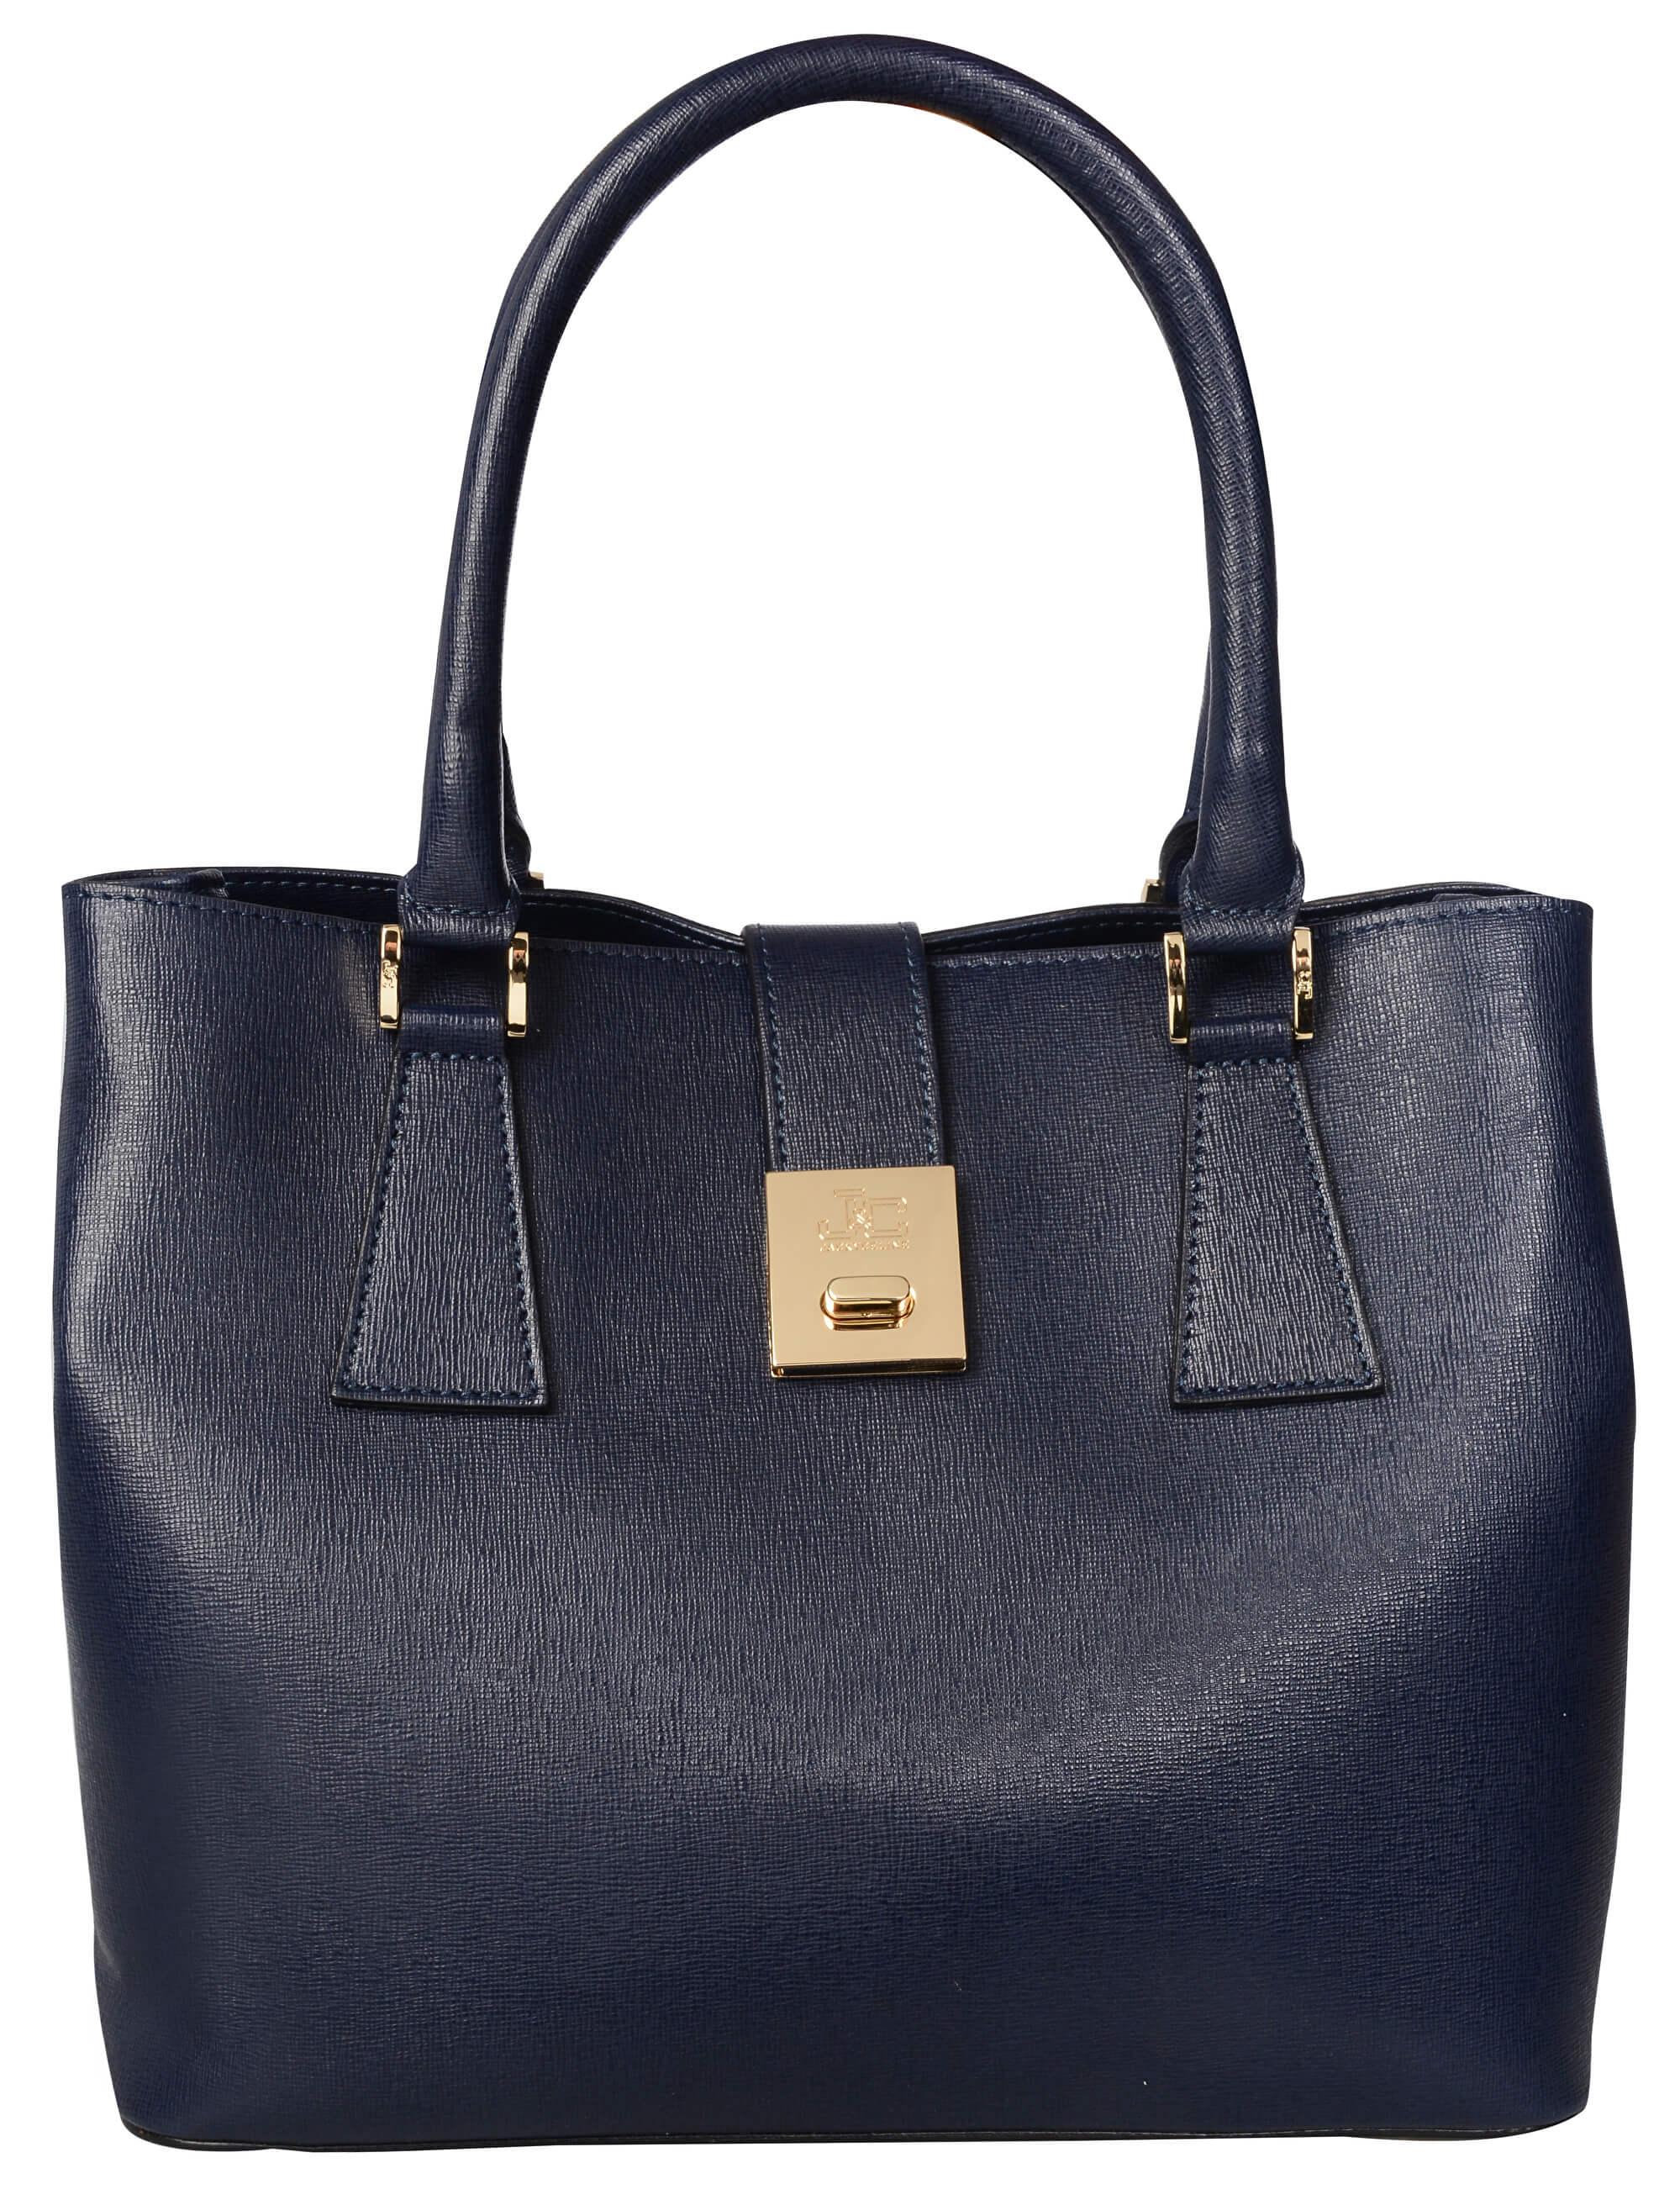 J C JACKYCELINE Dámská kožená kabelka Borsa Pelle S16B301-09-014 Dark Blue 3b363520bcb